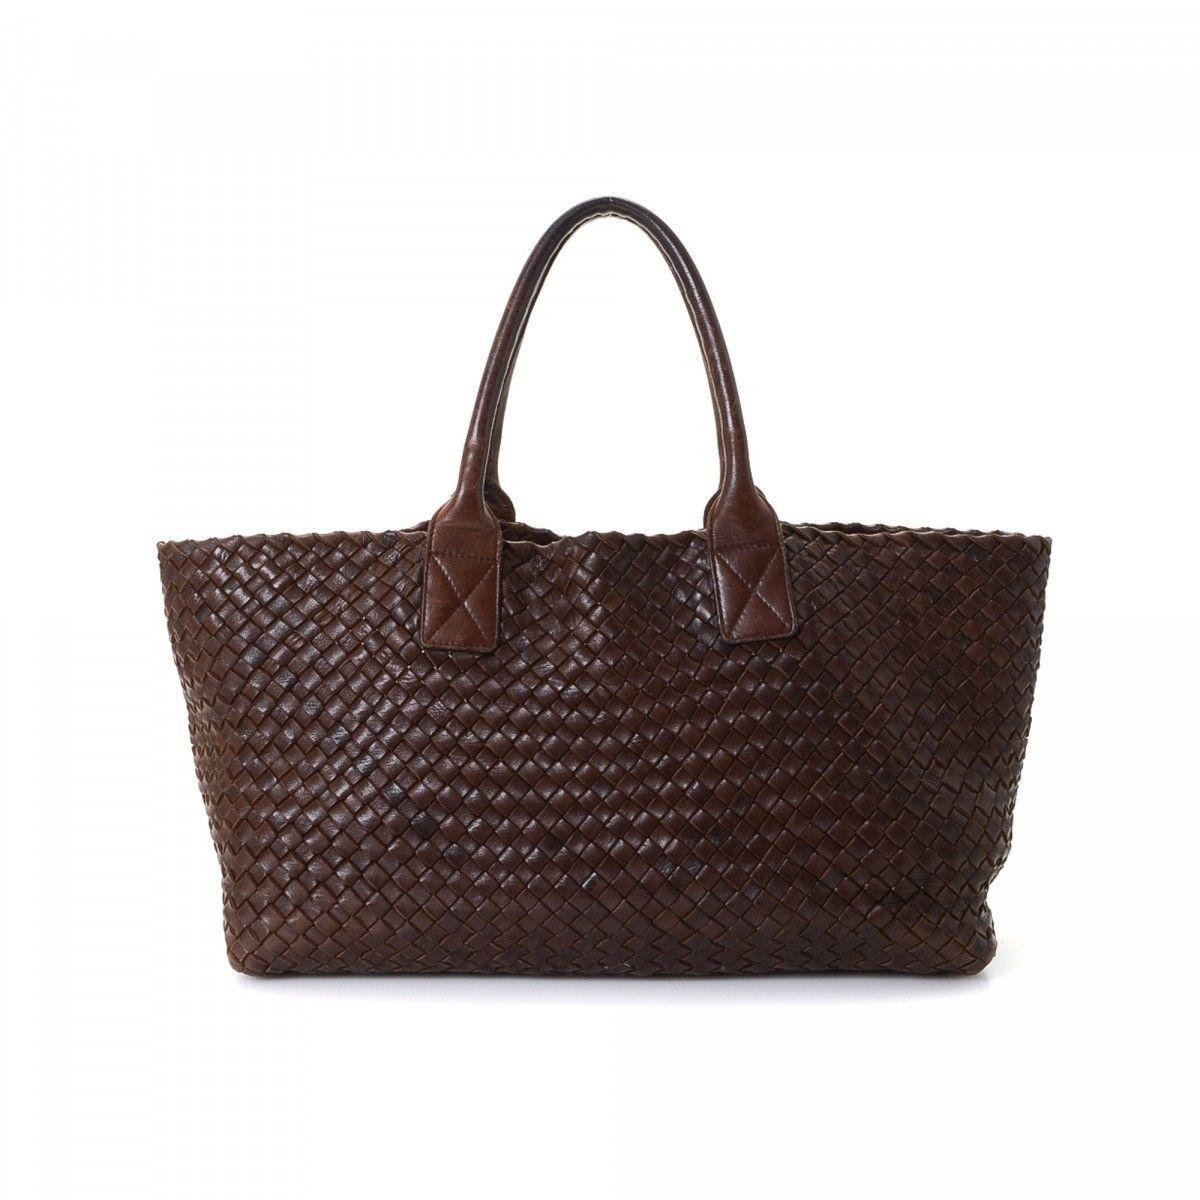 7ca00c5e00b LXRandCo guarantees this is an authentic vintage Bottega Veneta Cabat tote.  This classic work bag